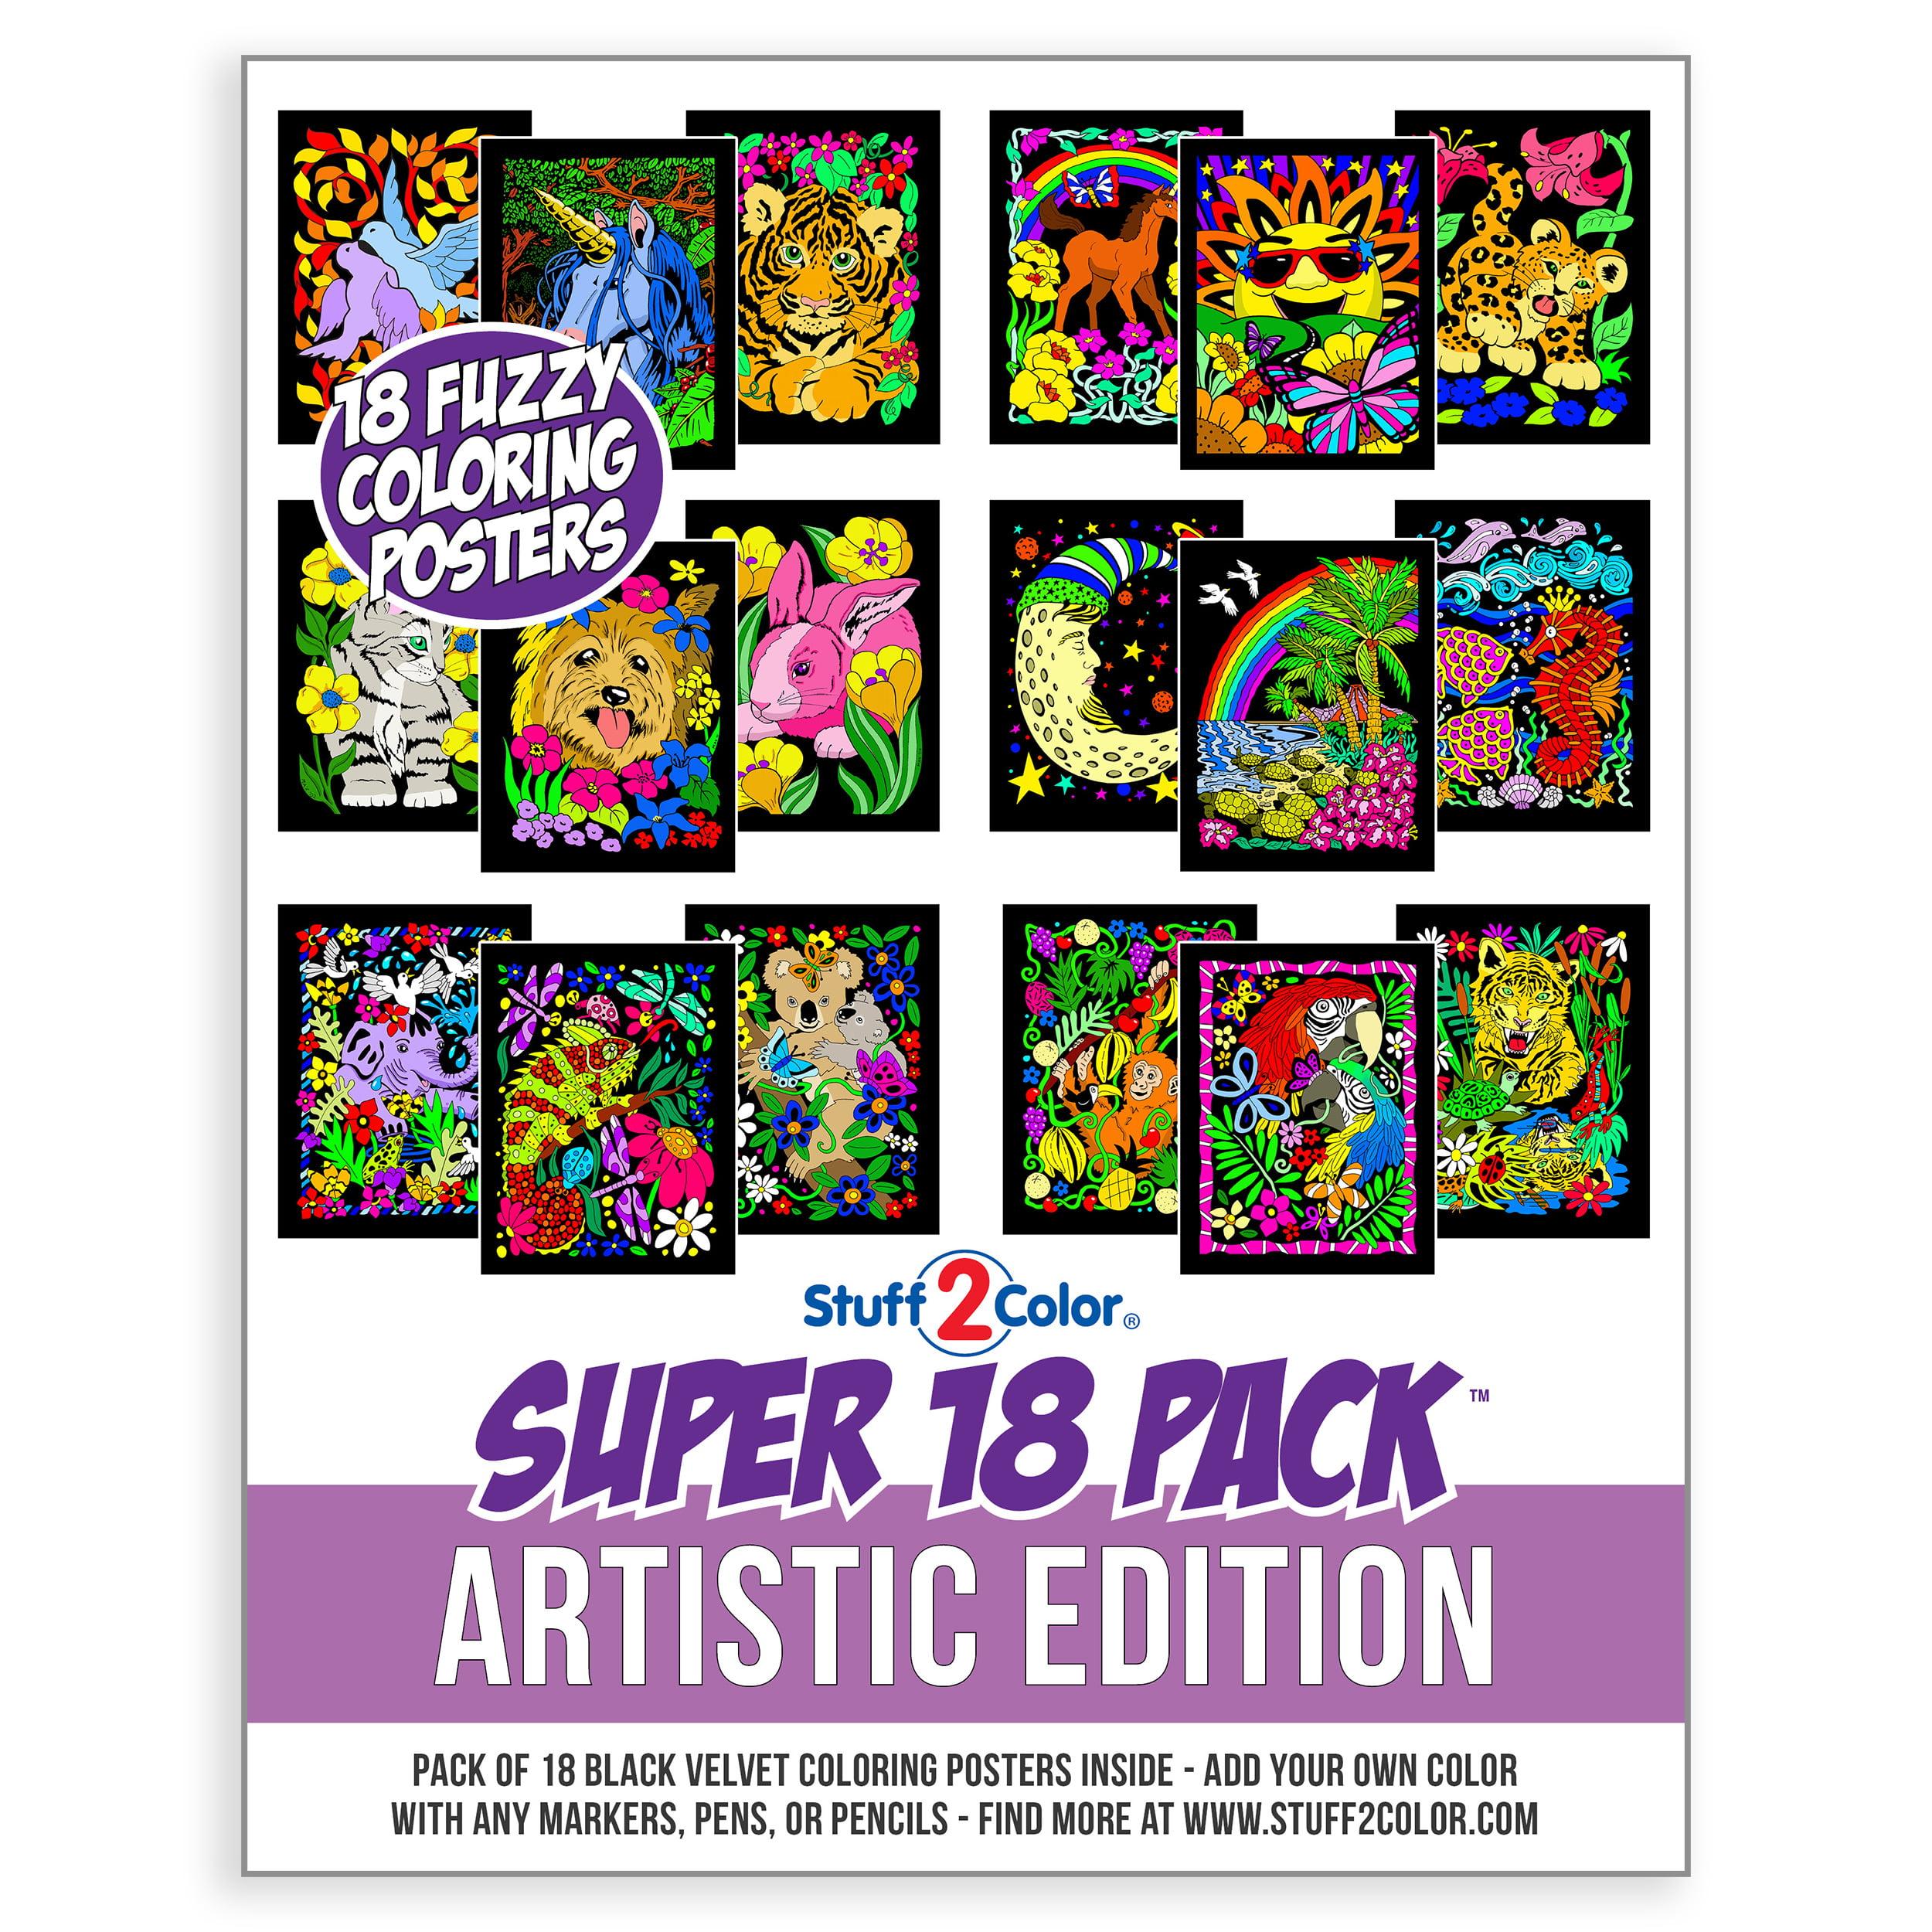 Super Pack Of 18 Fuzzy Velvet Coloring Posters (Artistic Edition) -  Stuff2Color - Walmart.com - Walmart.com